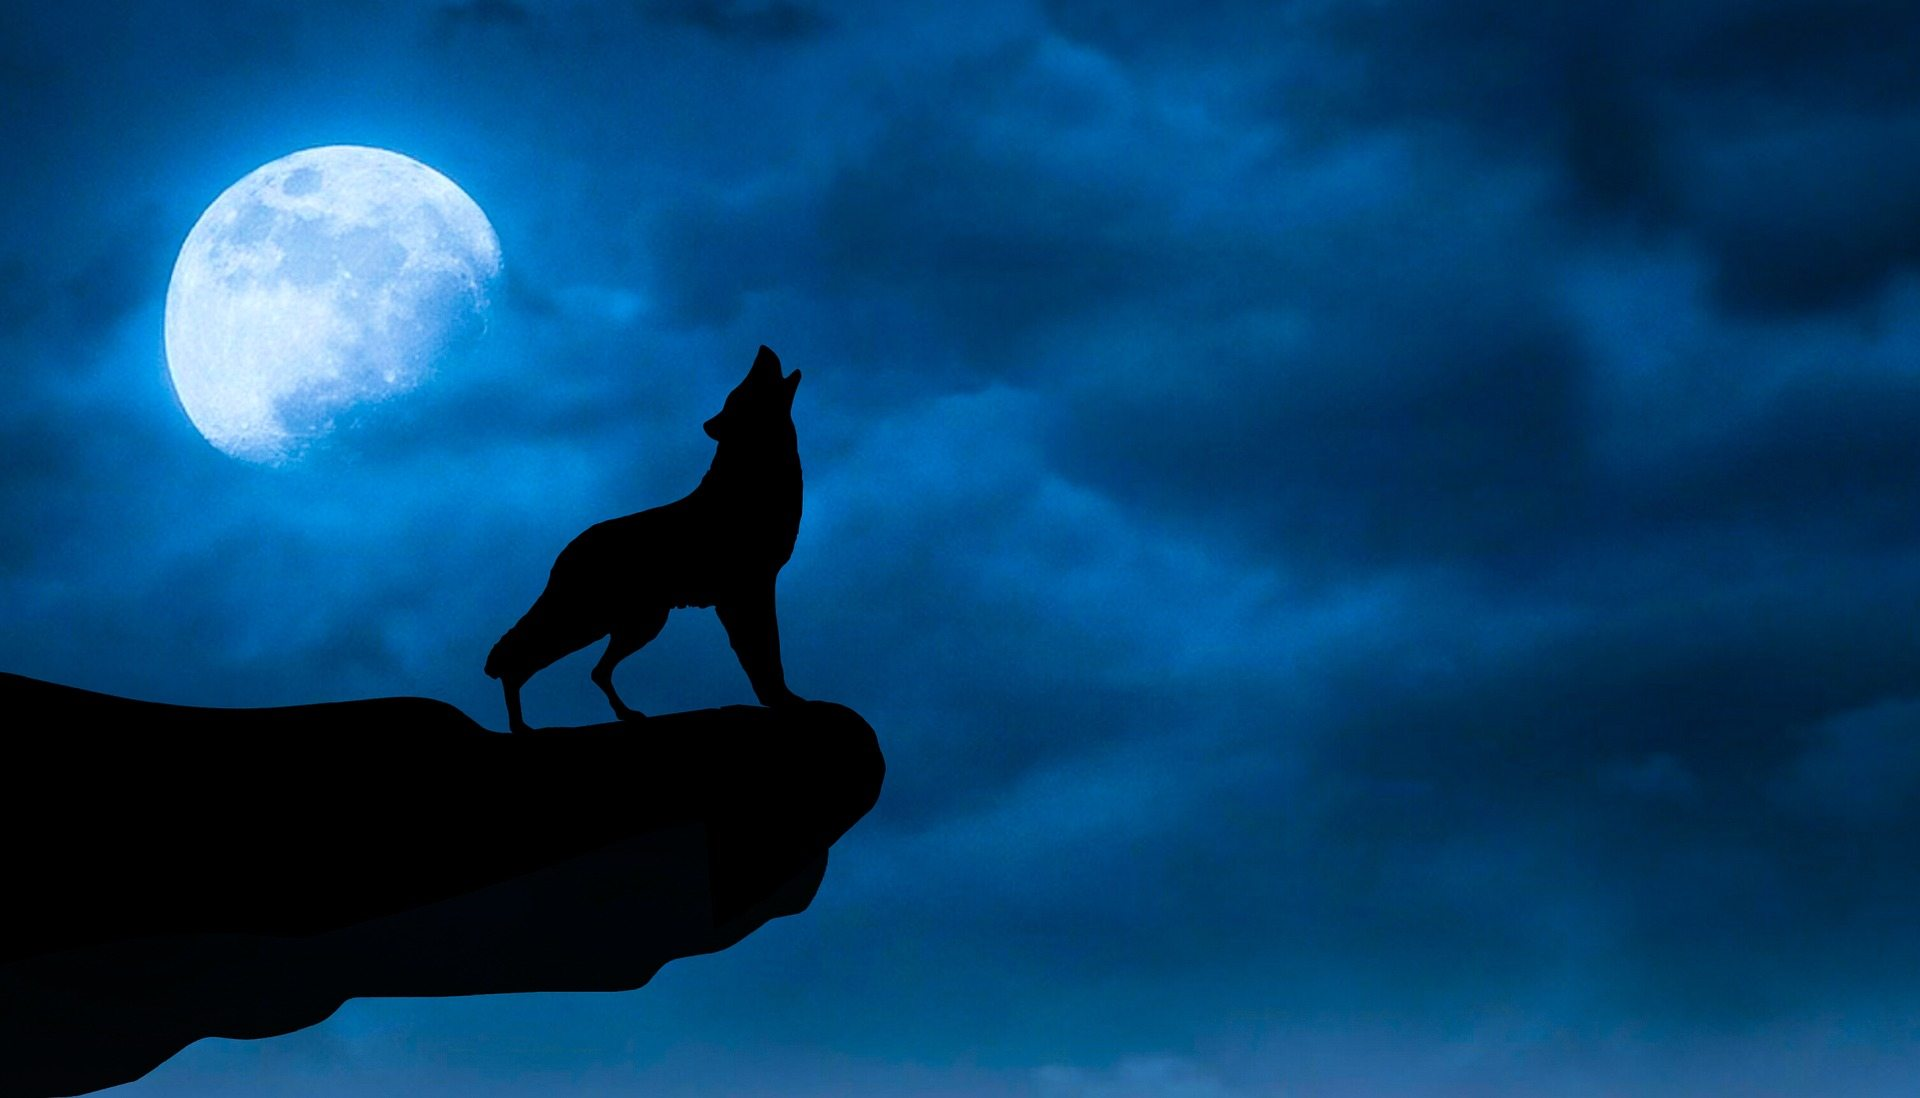 Dark Black Wolf Moon Wallpaper Hd Free Download Night Sky With Wolf 1920x1098 Wallpaper Teahub Io